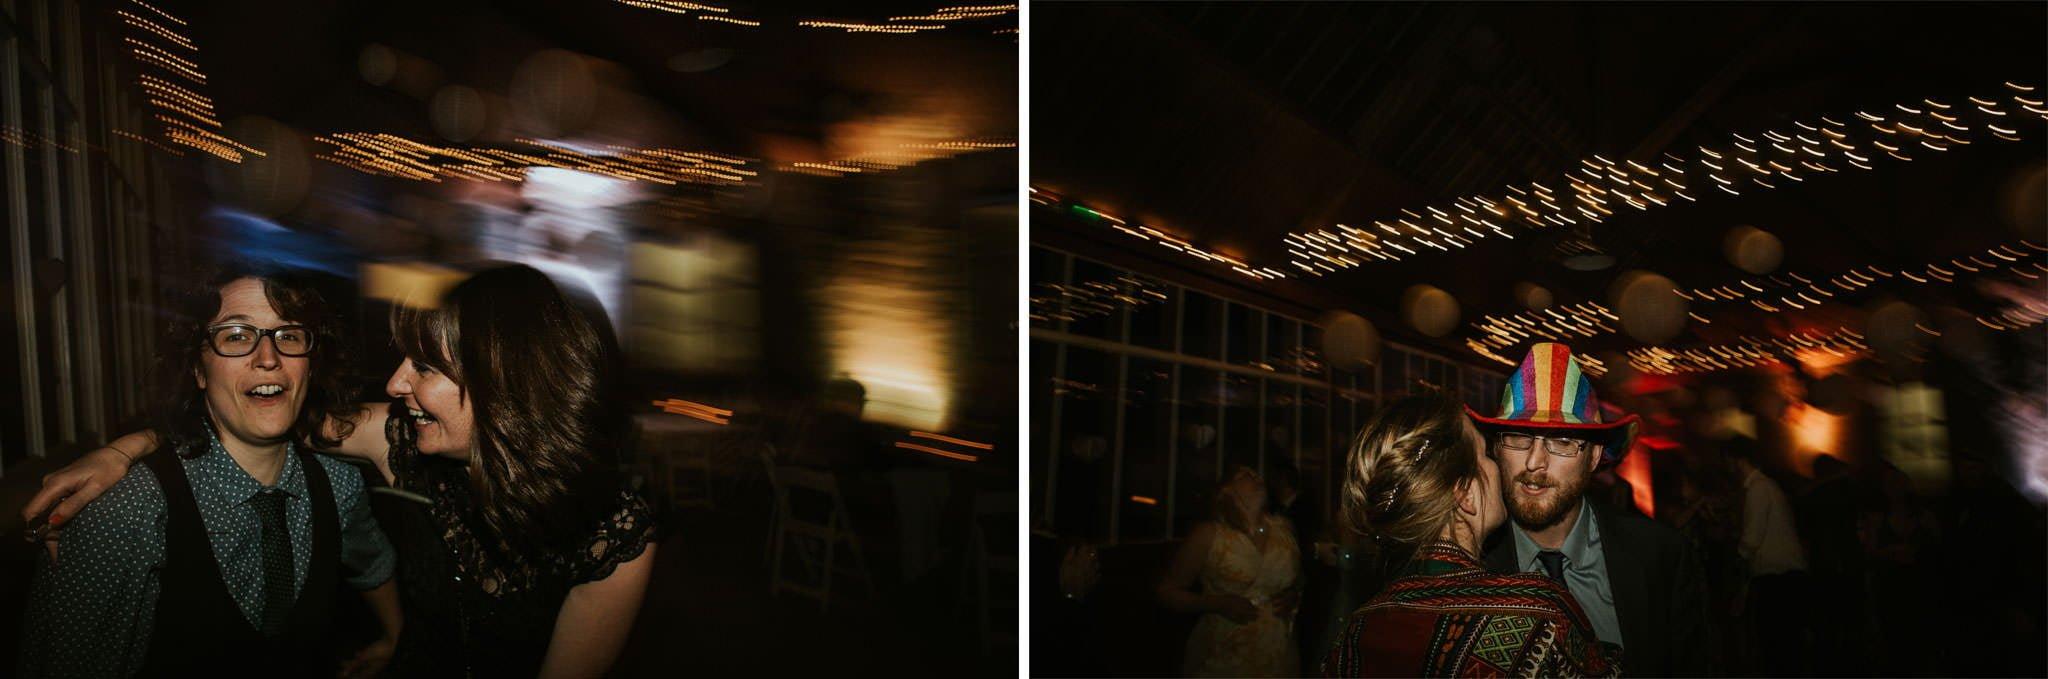 fine-art-wedding-photography-scotland 126